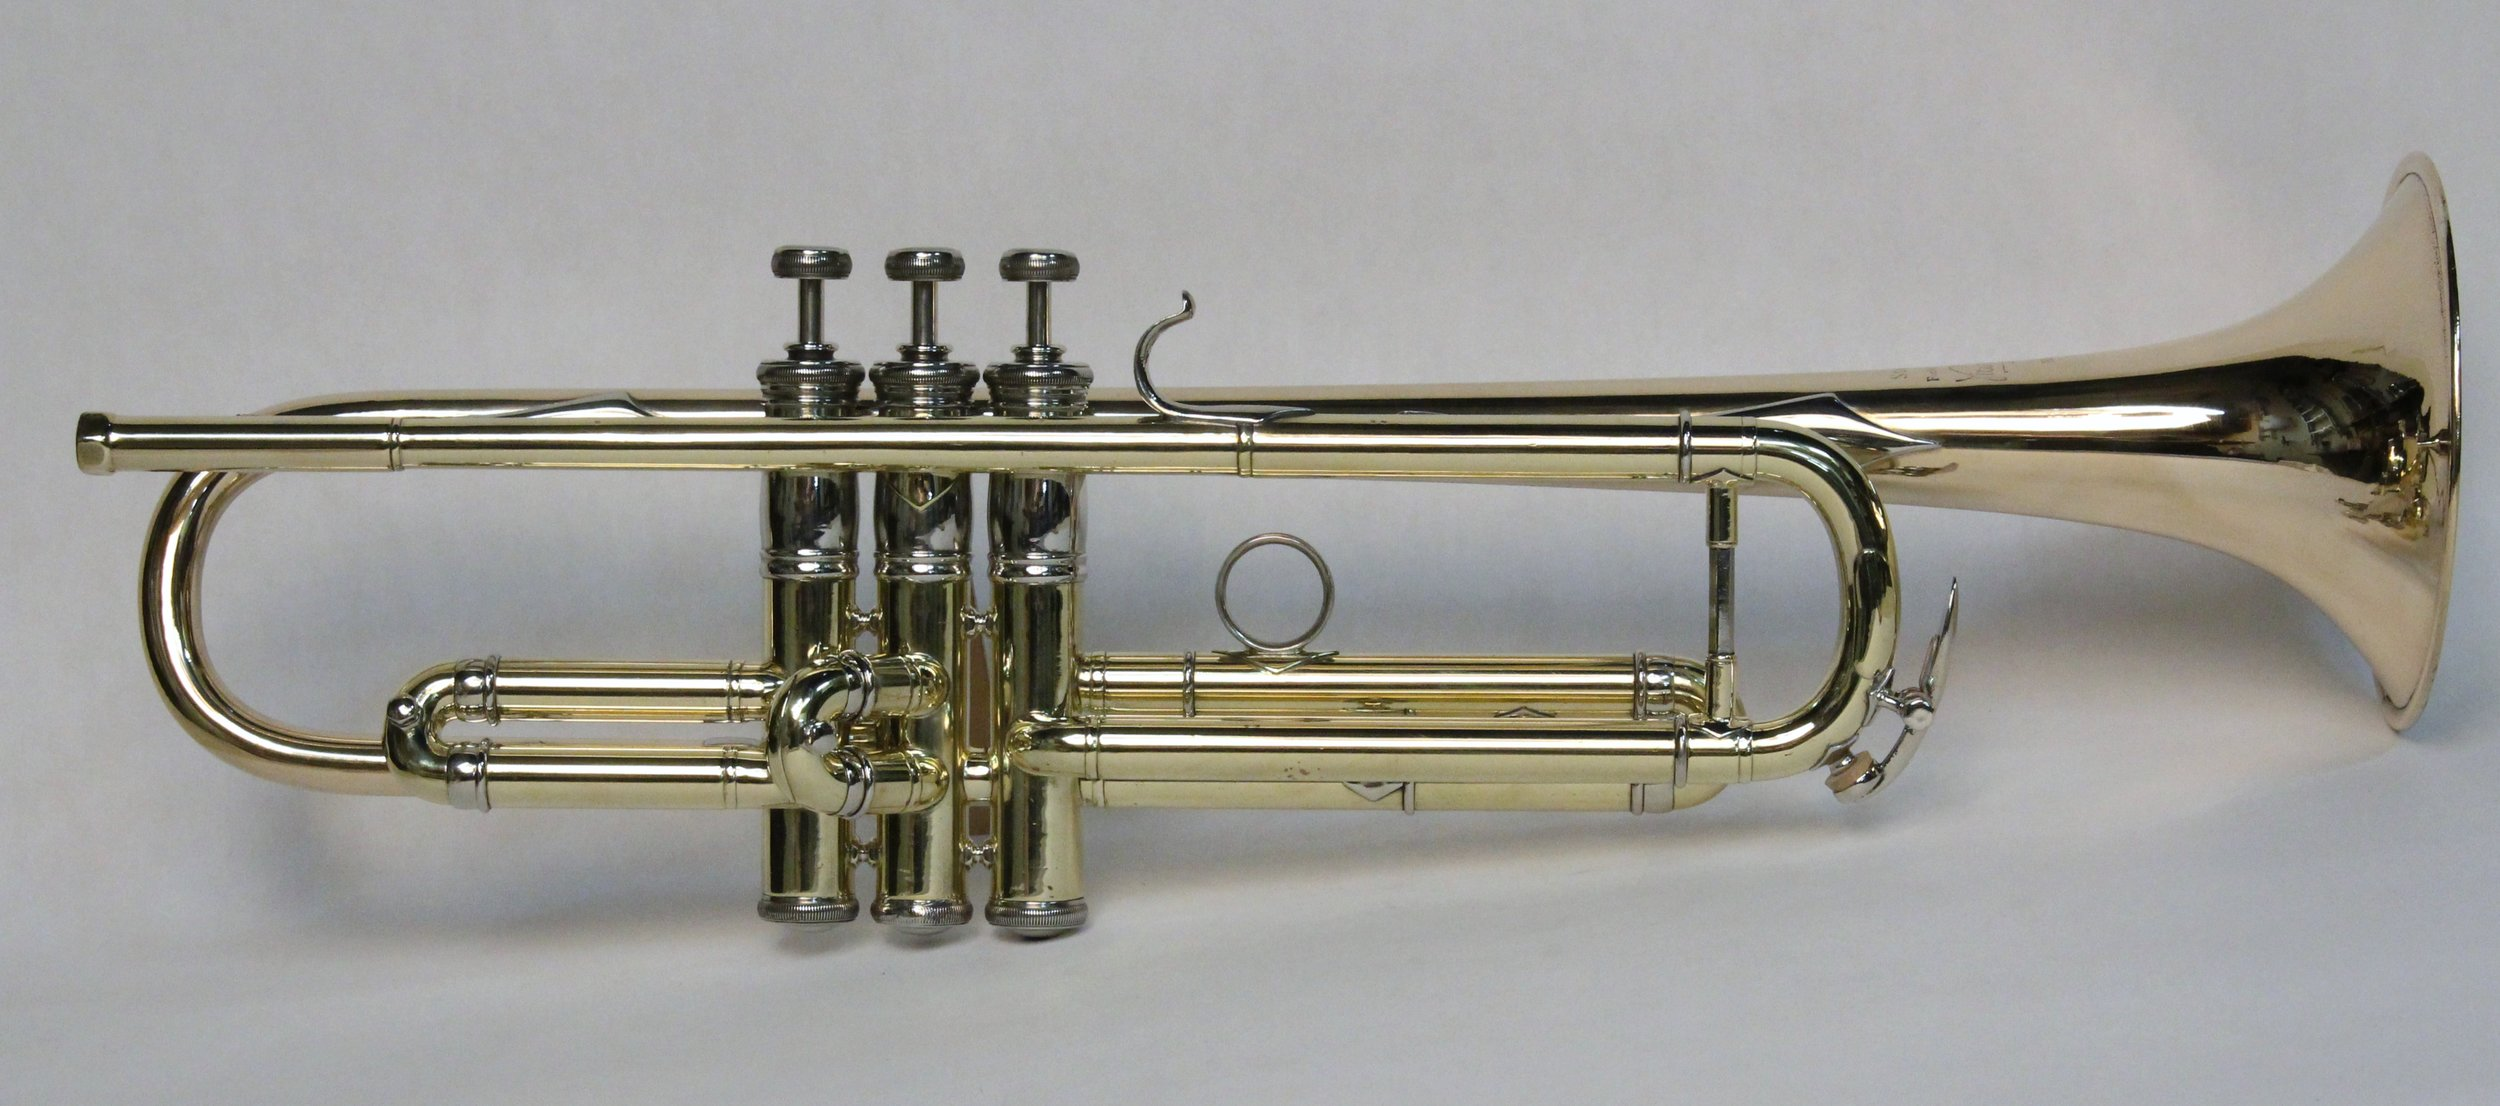 Bach Trumpet #16